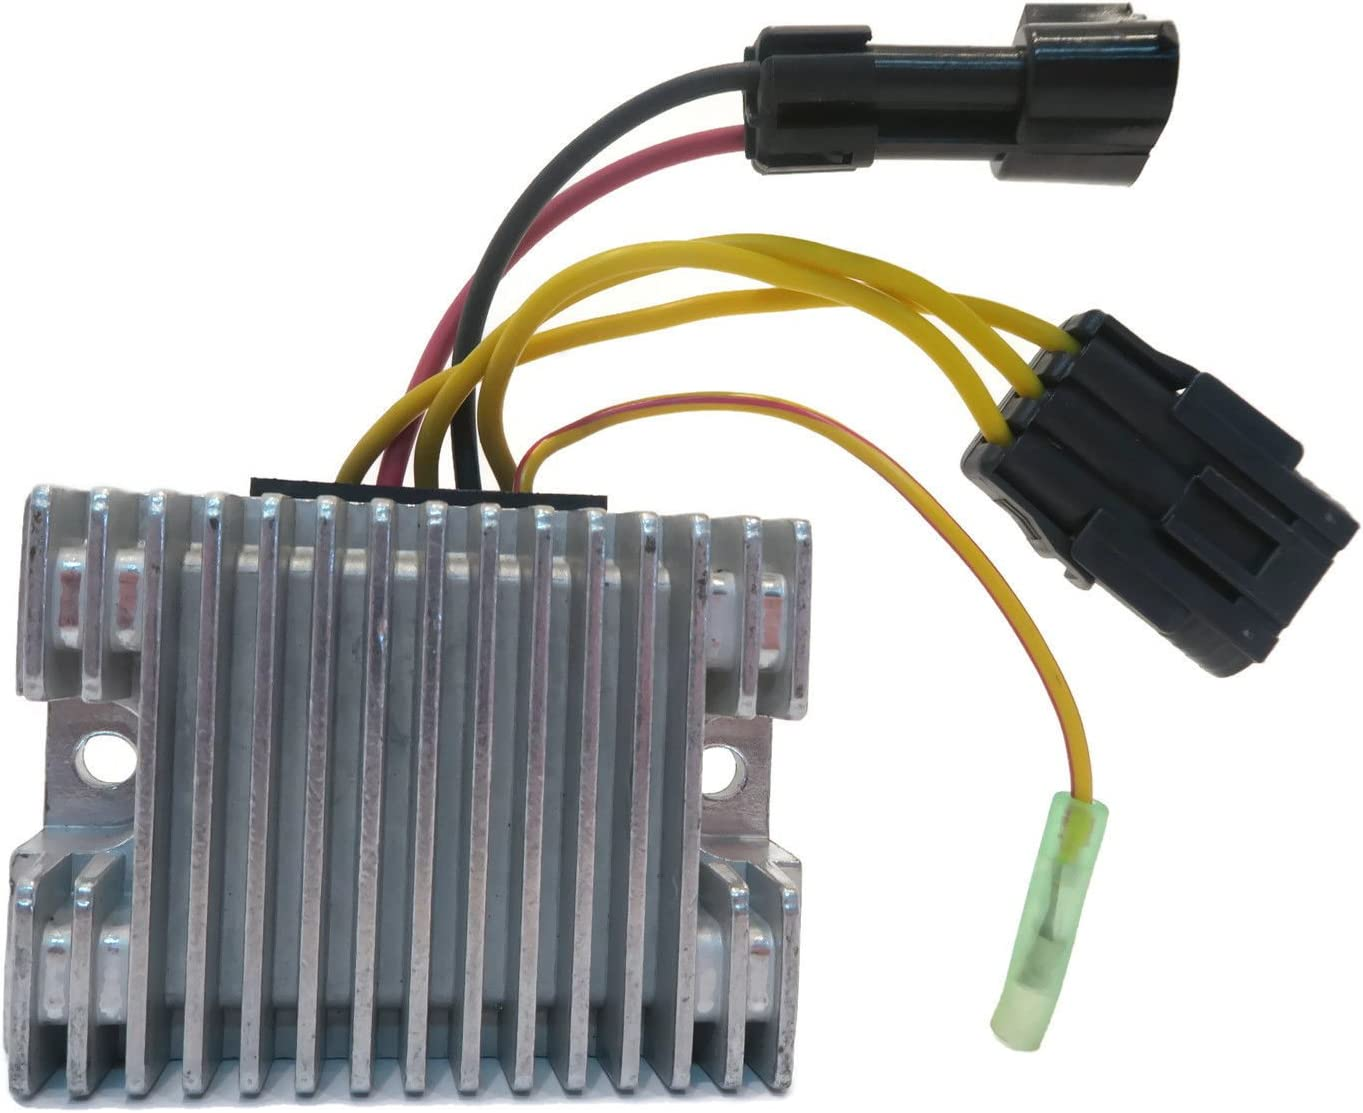 Mosfet Voltage Regulator Rectifier For Polaris ATV Ranger Sportsman Hawkeye 400 500 2009-2013 Repl.# 4013247 4013904 4014029 4015229